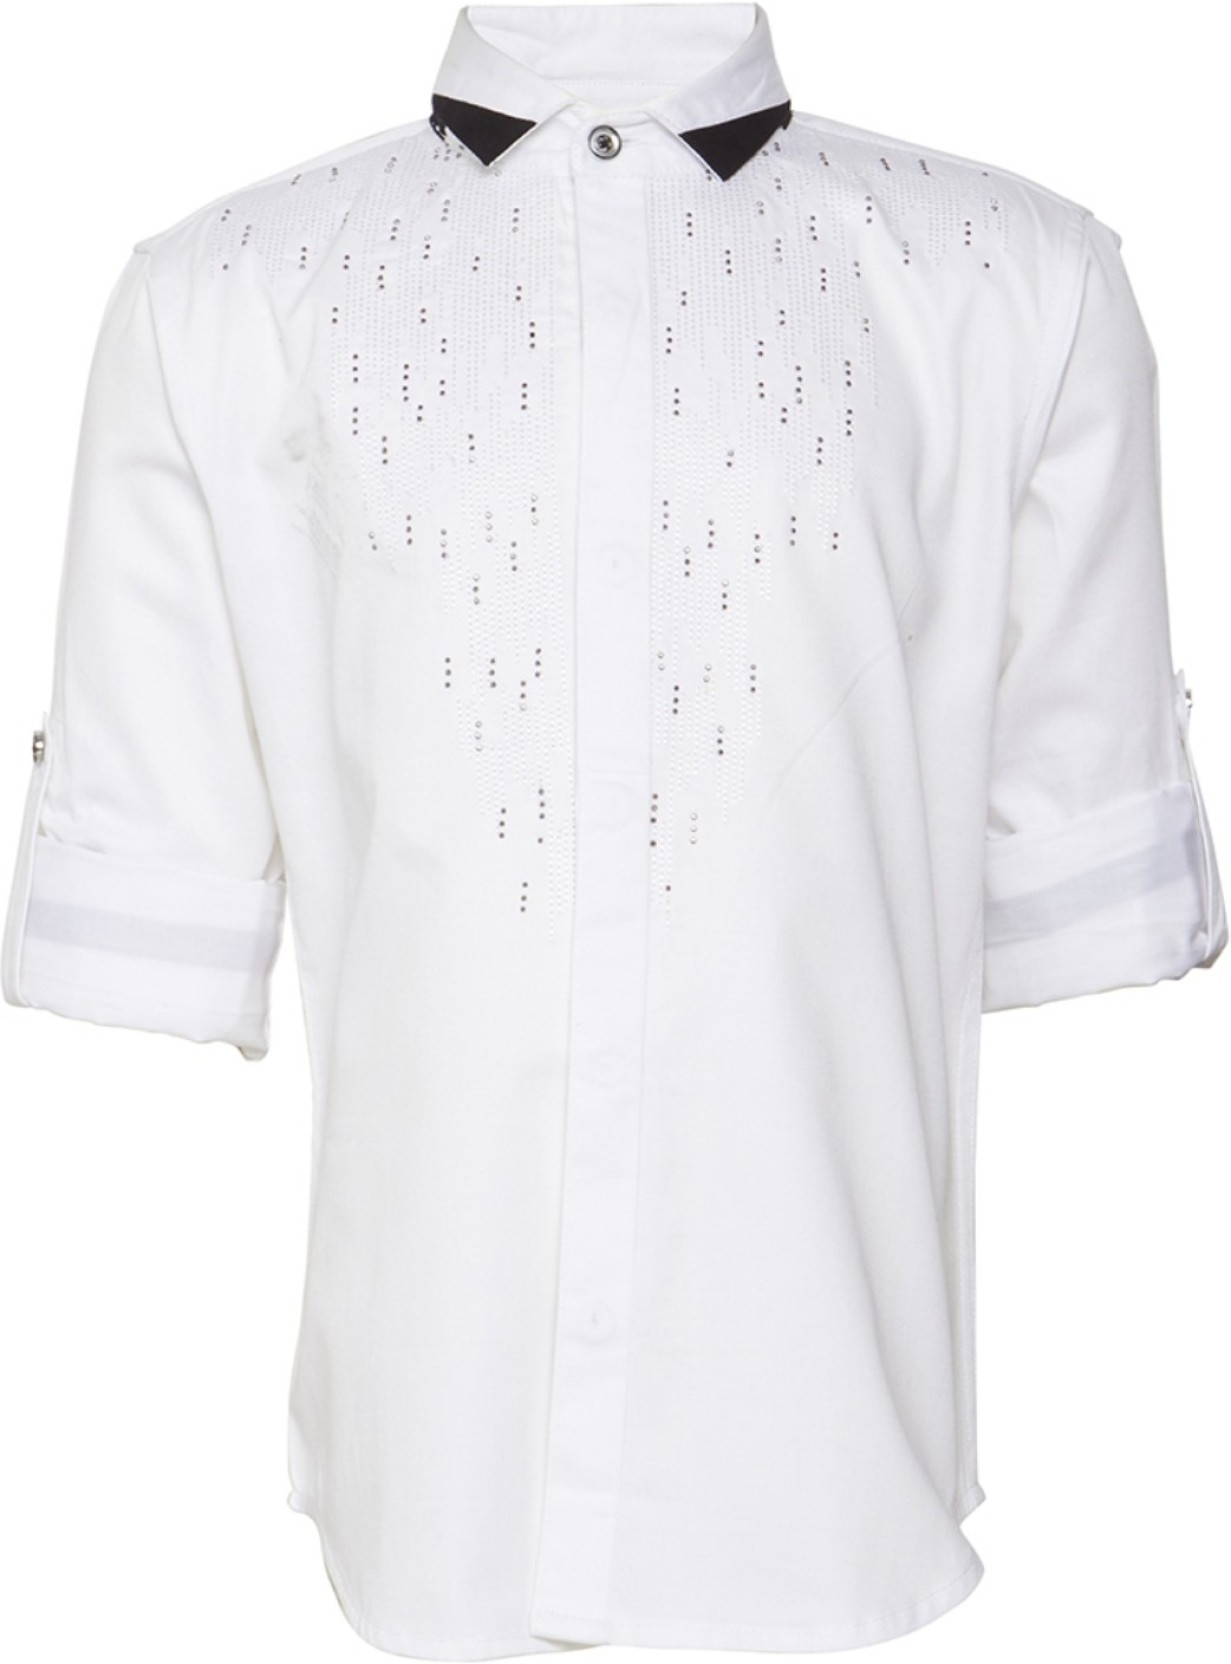 ed3e70c5ea7f OKS BOYS Boy's Embroidered Casual Spread Shirt - Buy OKS BOYS Boy's ...